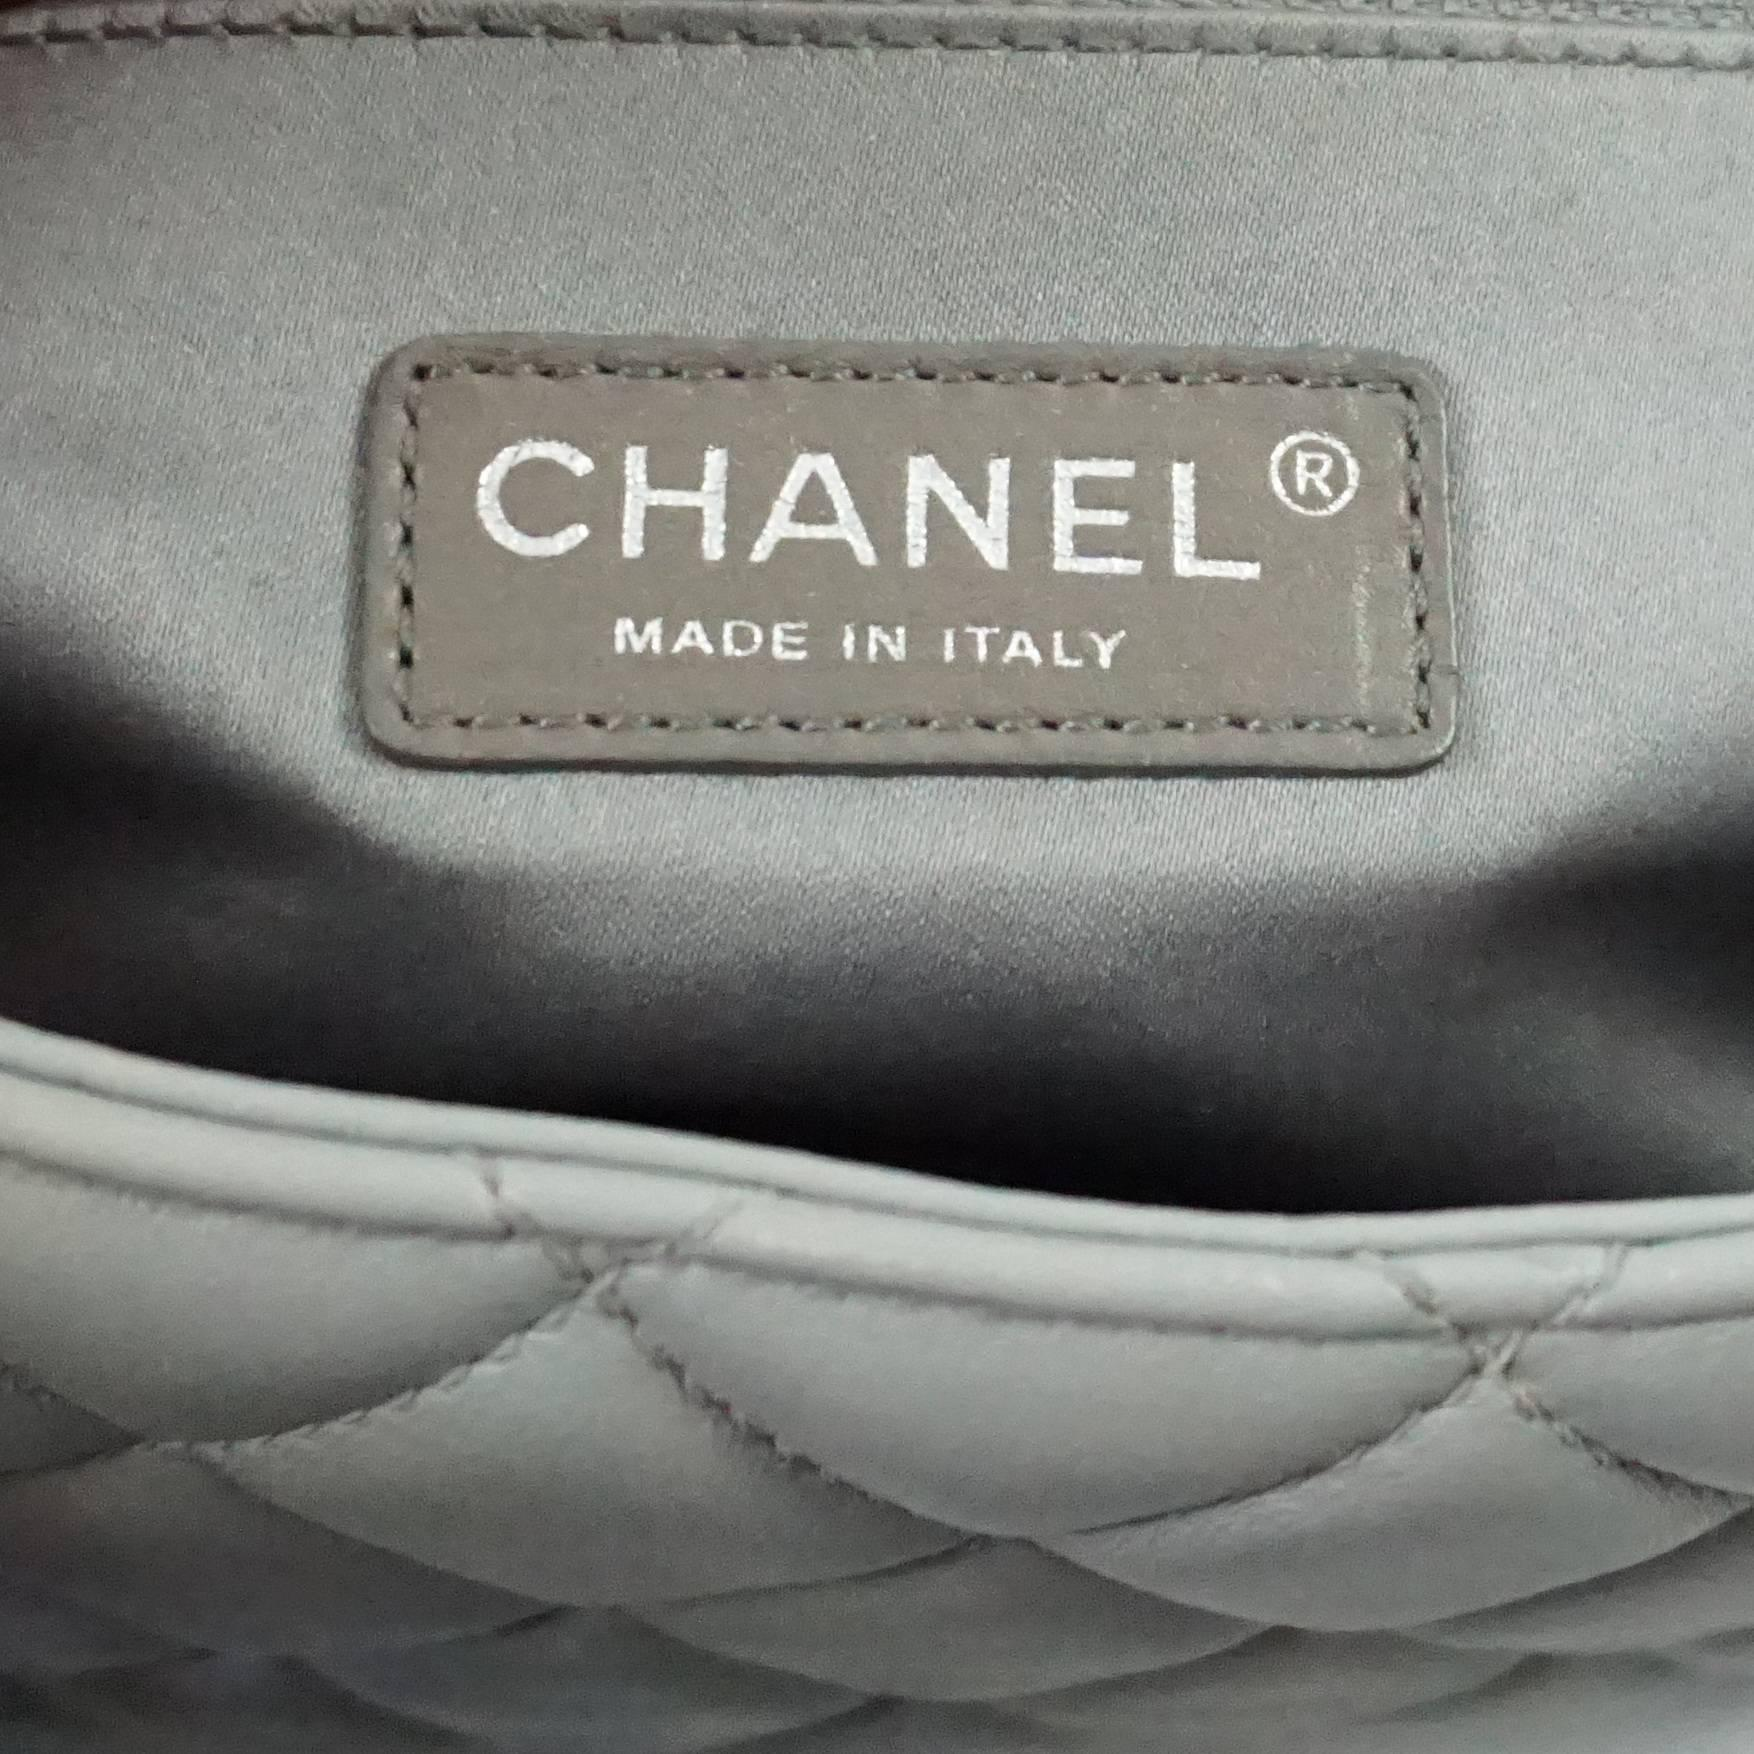 474273494ee1 Chanel Light Grey Quilted Lambskin Rain Coat Shanghai Paris Bag - SHW -  2009 at 1stdibs